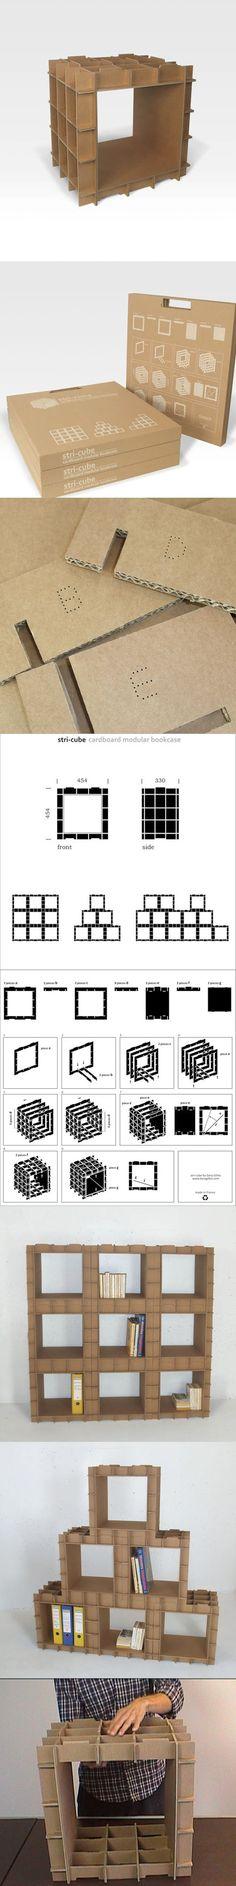 Estanterías con piezas de cartón - Muy Ingenioso